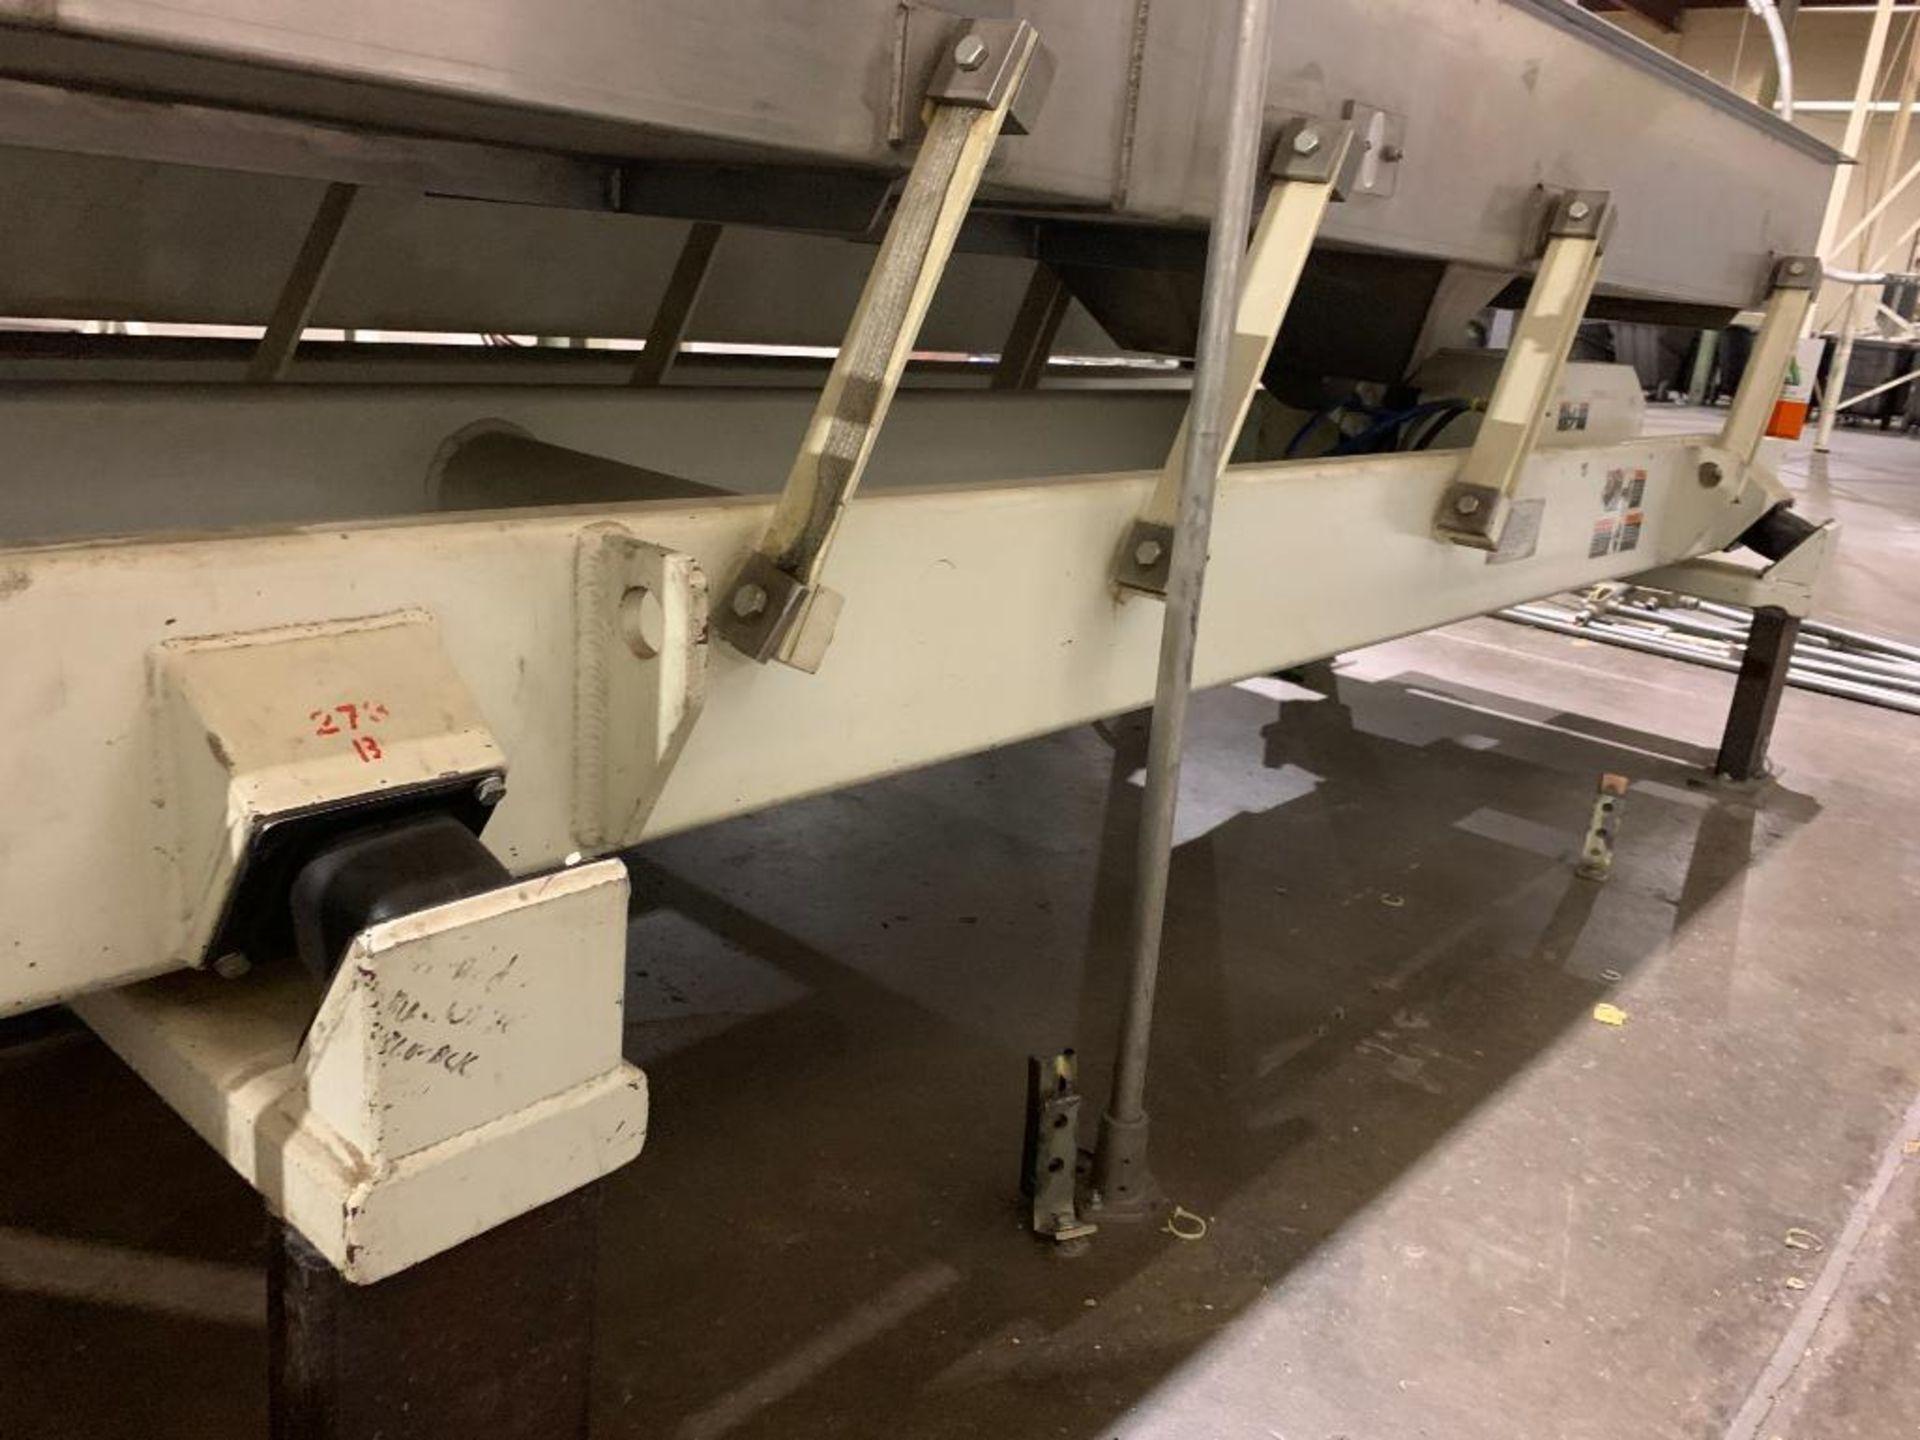 1992 Link-Belt vibratory conveyor, model LBL2405-10X12-10 - Image 12 of 34